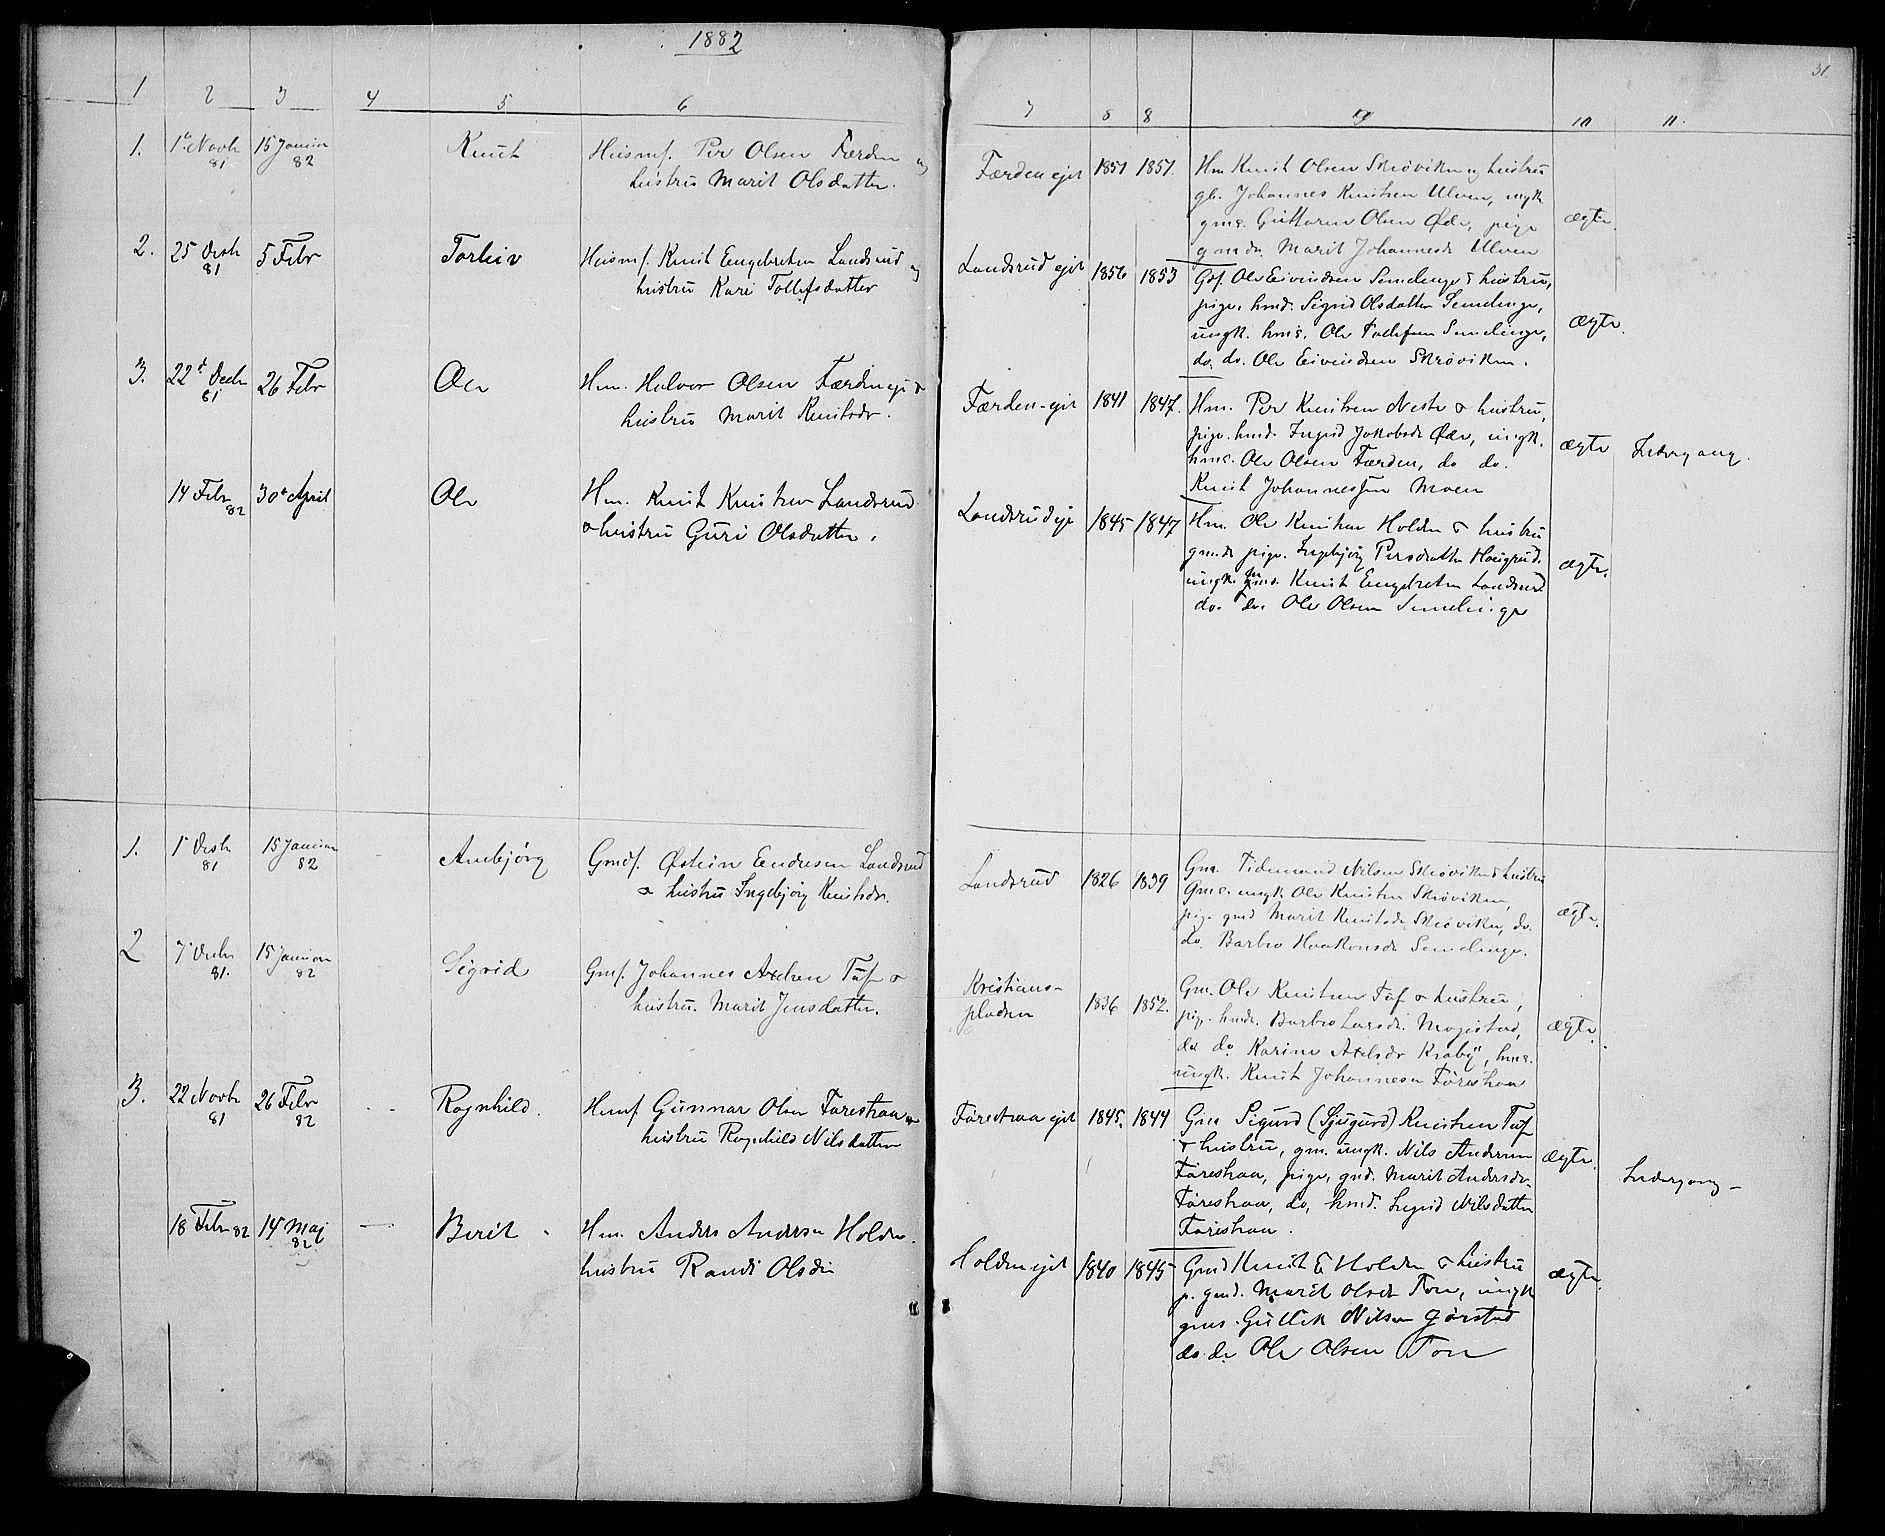 SAH, Vestre Slidre prestekontor, Klokkerbok nr. 3, 1869-1882, s. 31